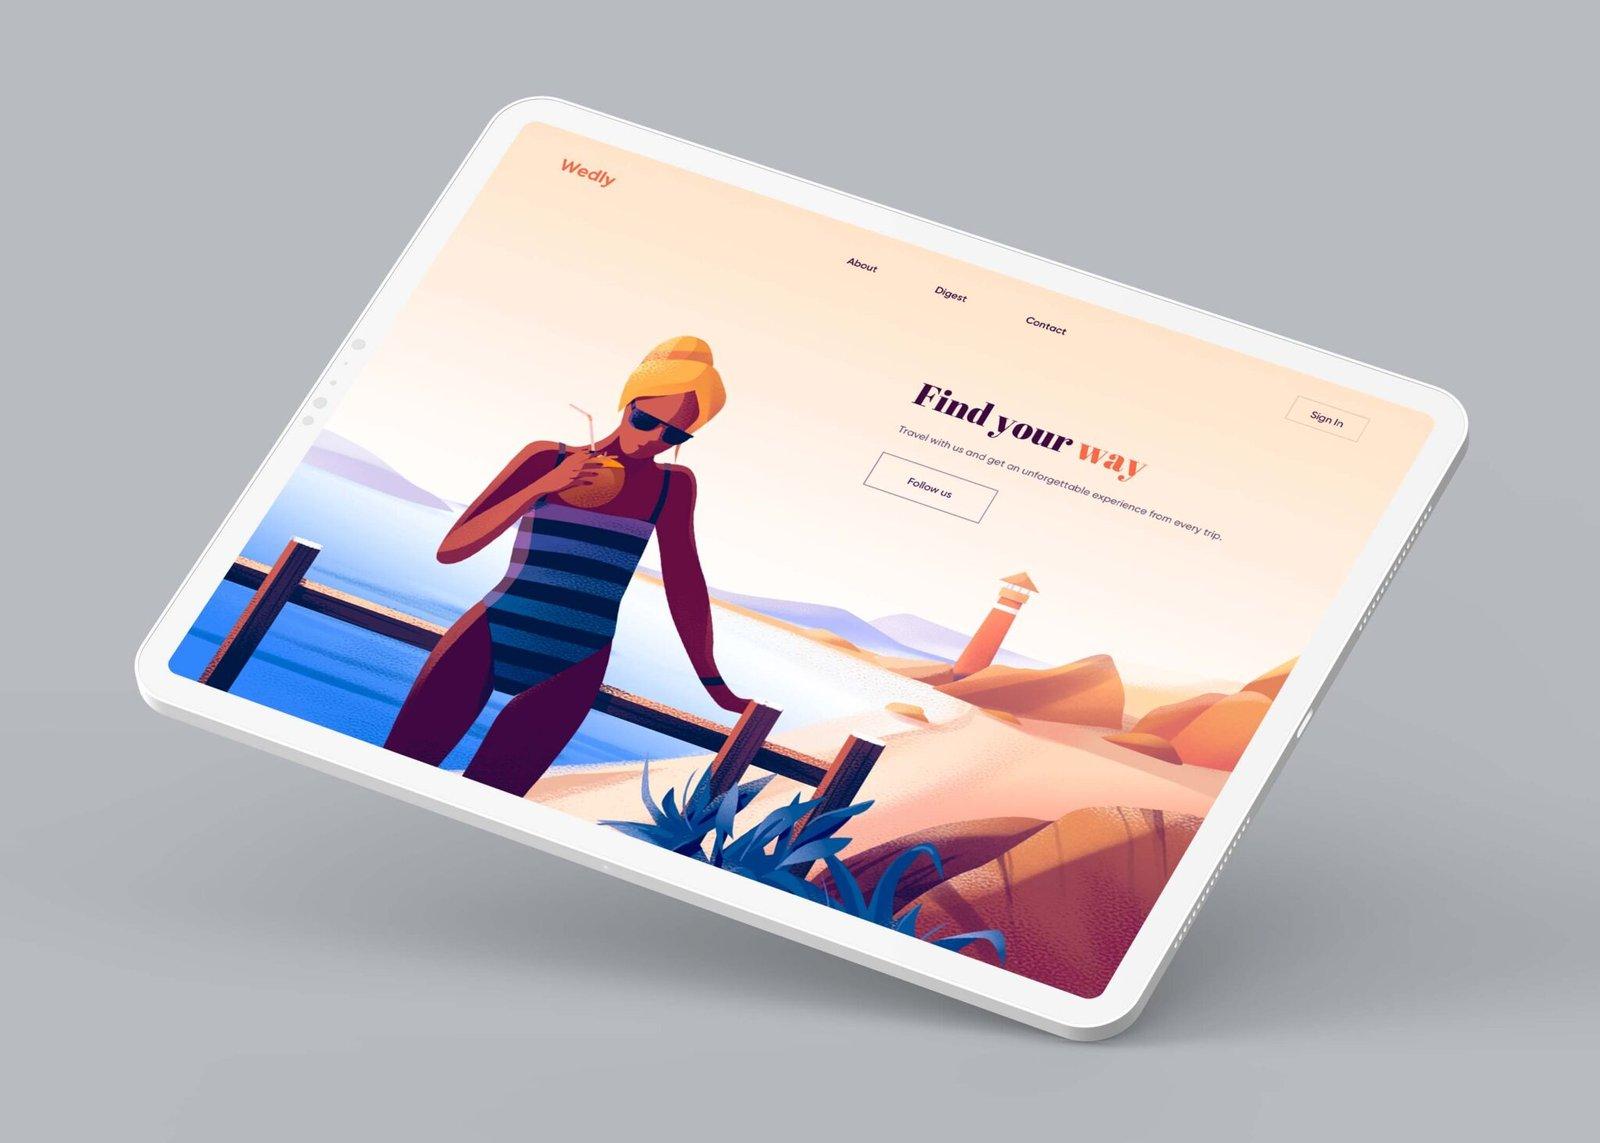 Free Floating iPad Pro Mockup